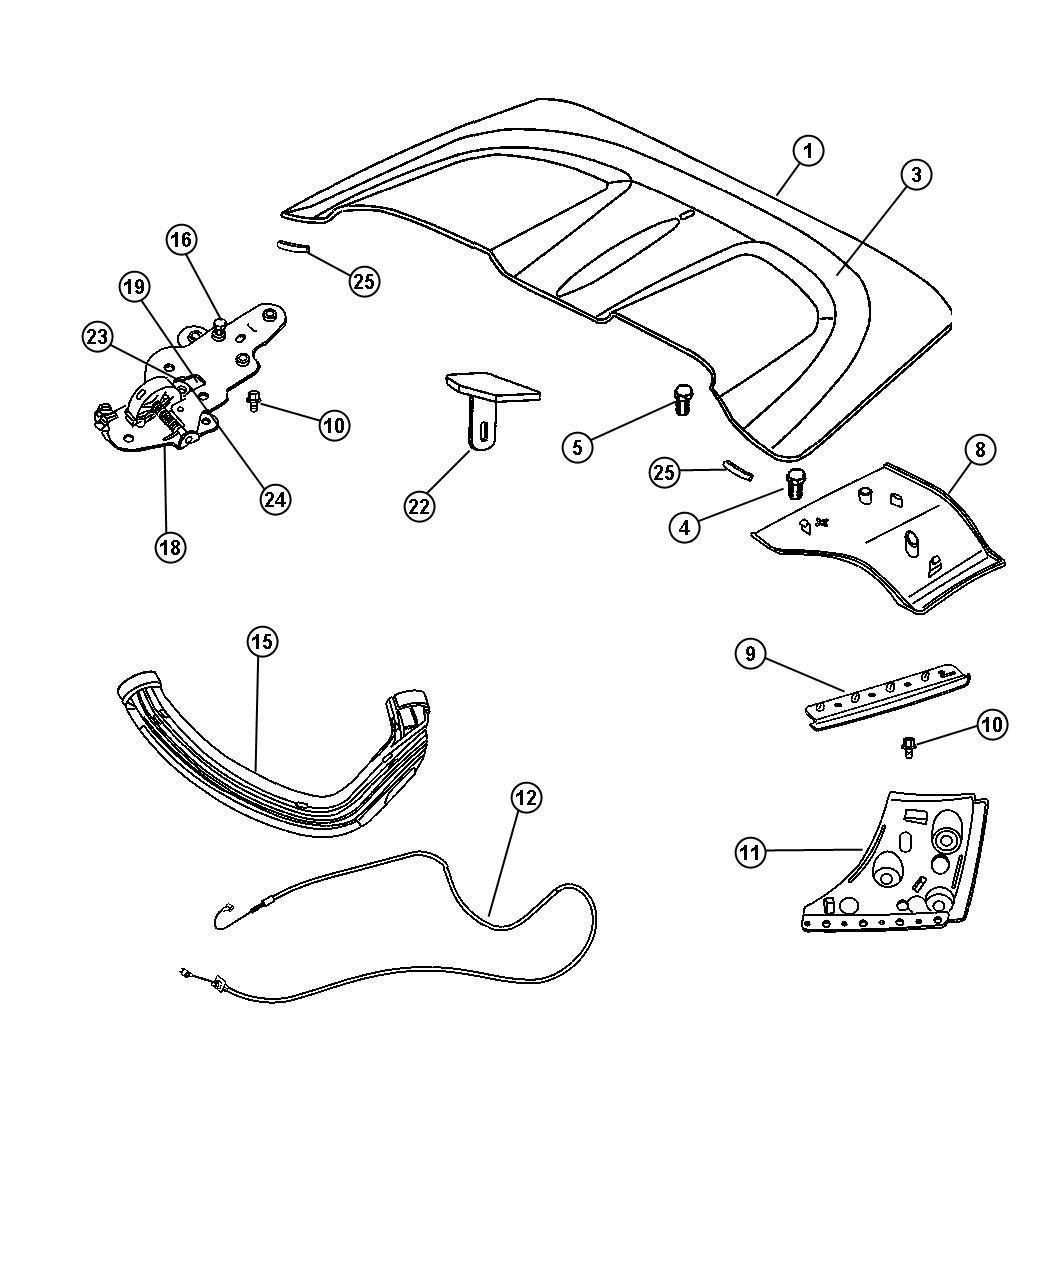 Chrysler Crossfire Bracket. Trunk divider panel. Includes